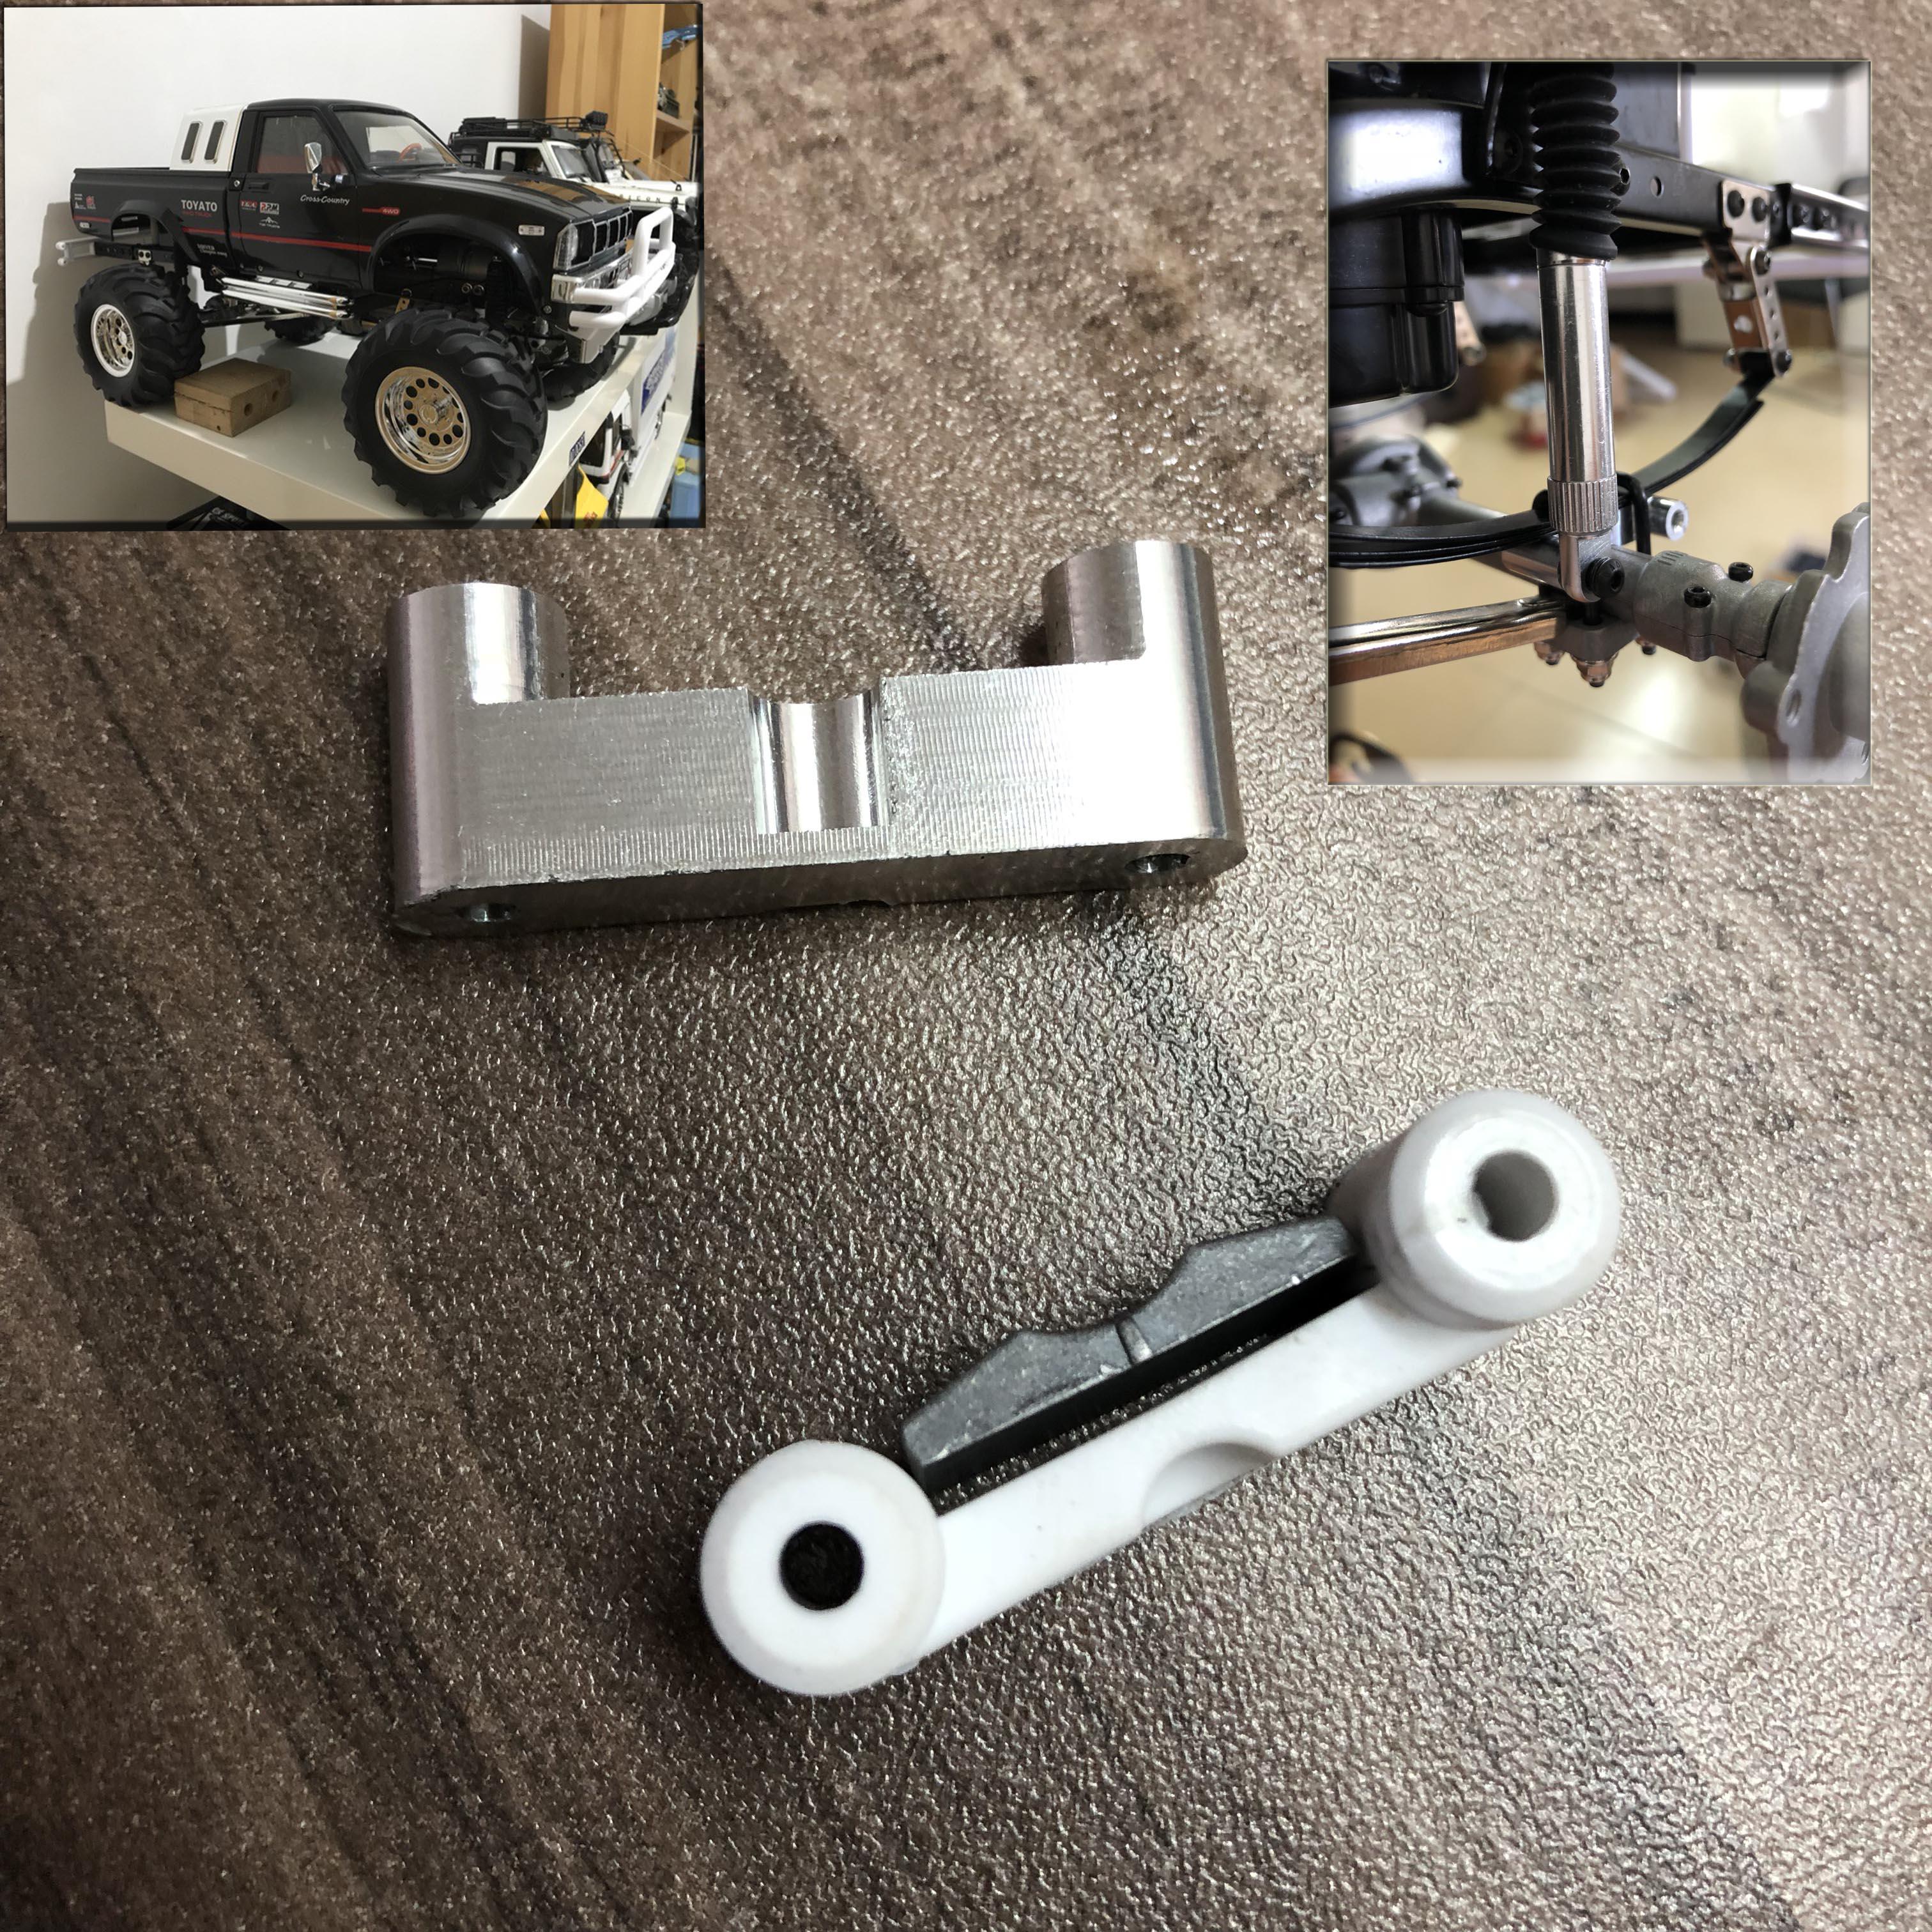 Tamiya Model Car HG-P407 1/10Remote Control Model Car Upgraded Component Original Metal Shock Absorber Fixed Seat